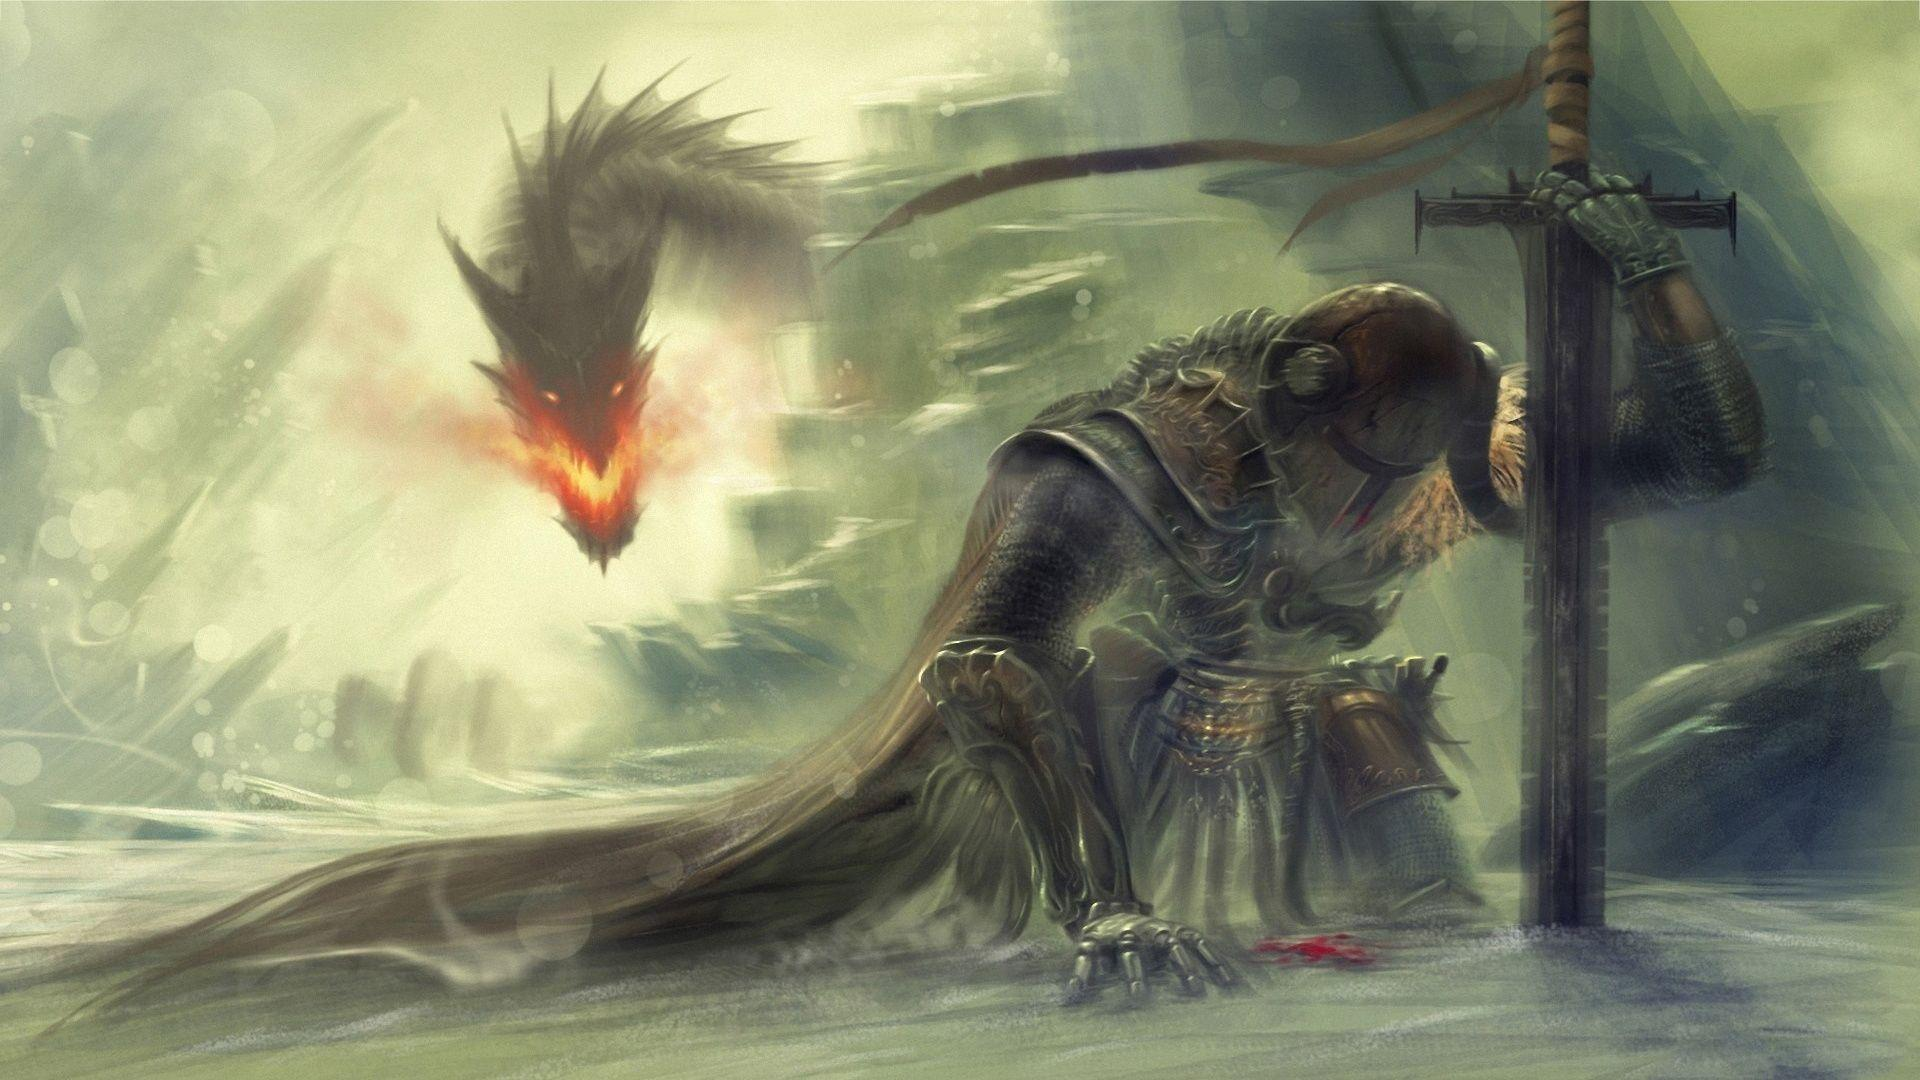 skyrim dragonborn wallpaper 1920x1080